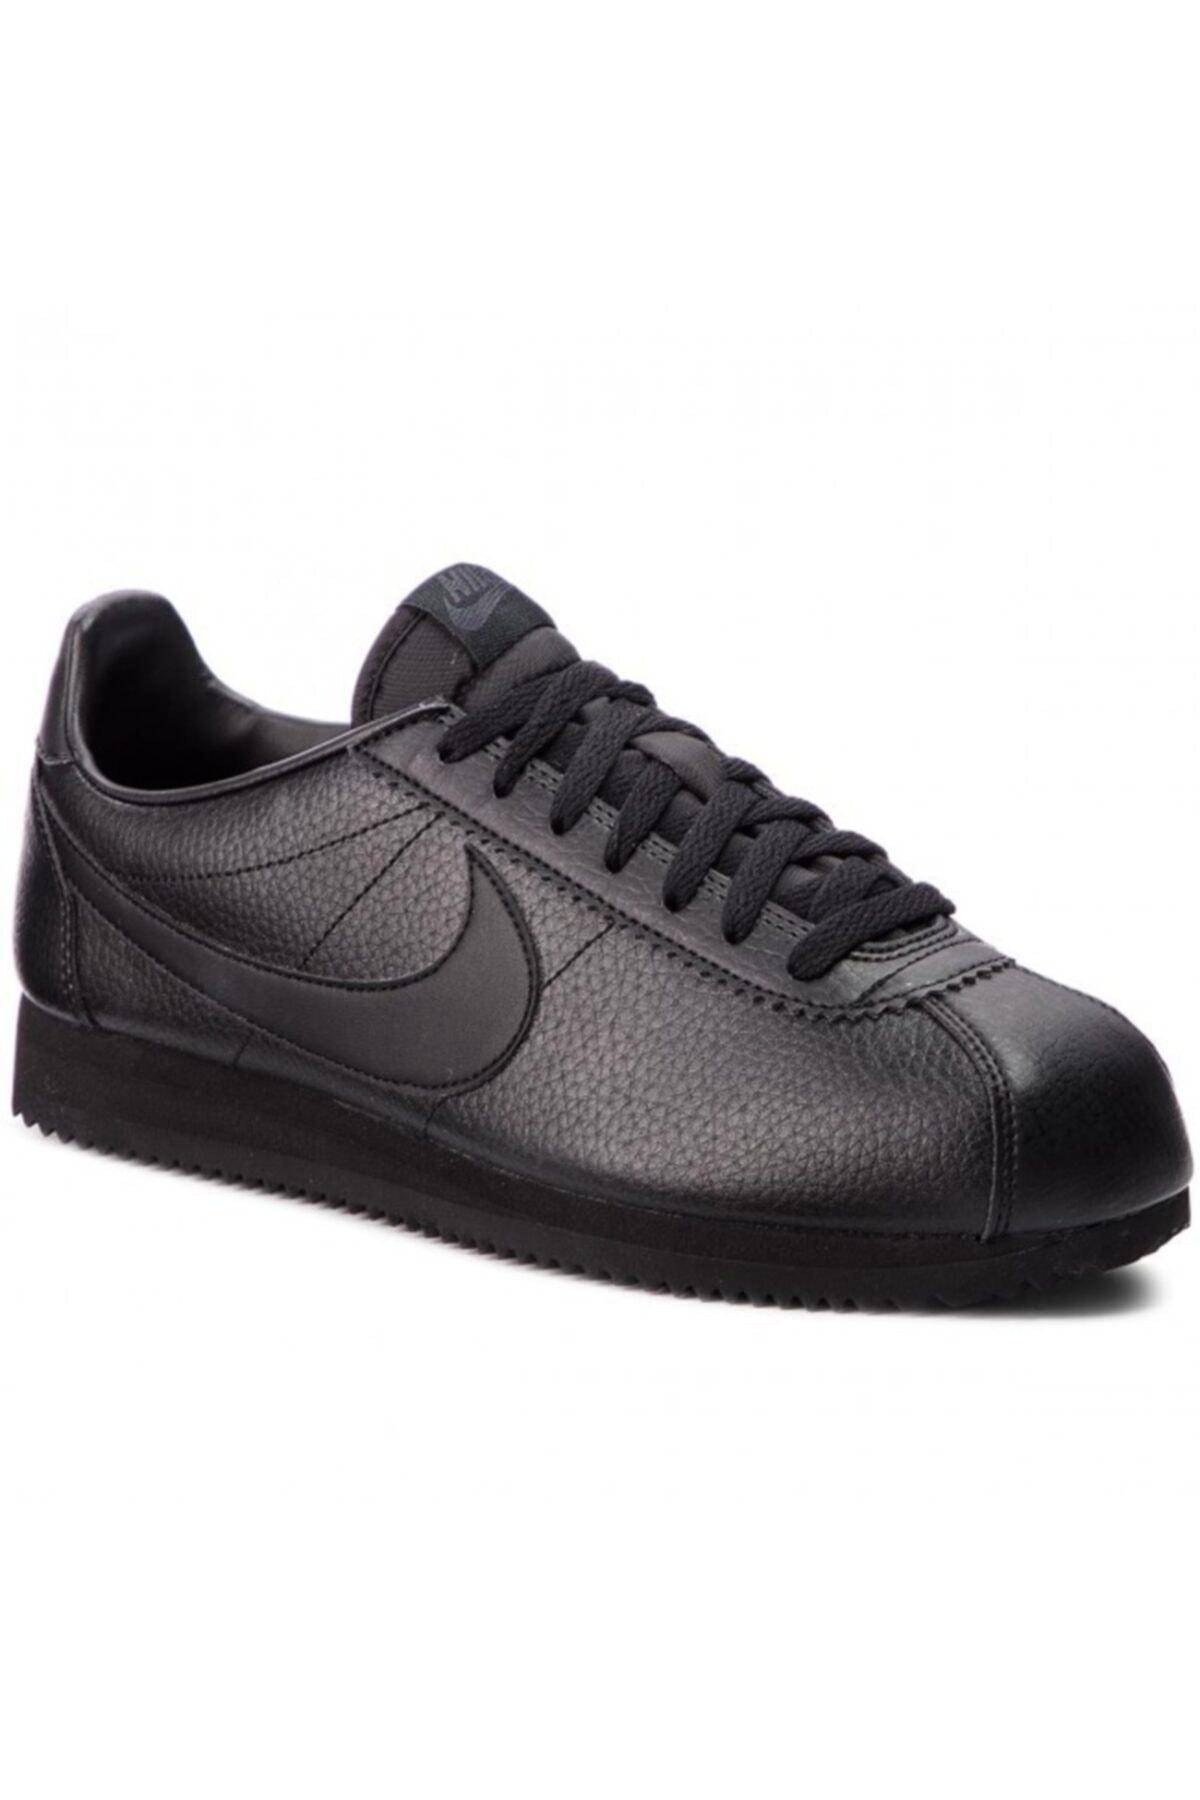 Nike Classic Cortez Leather 1